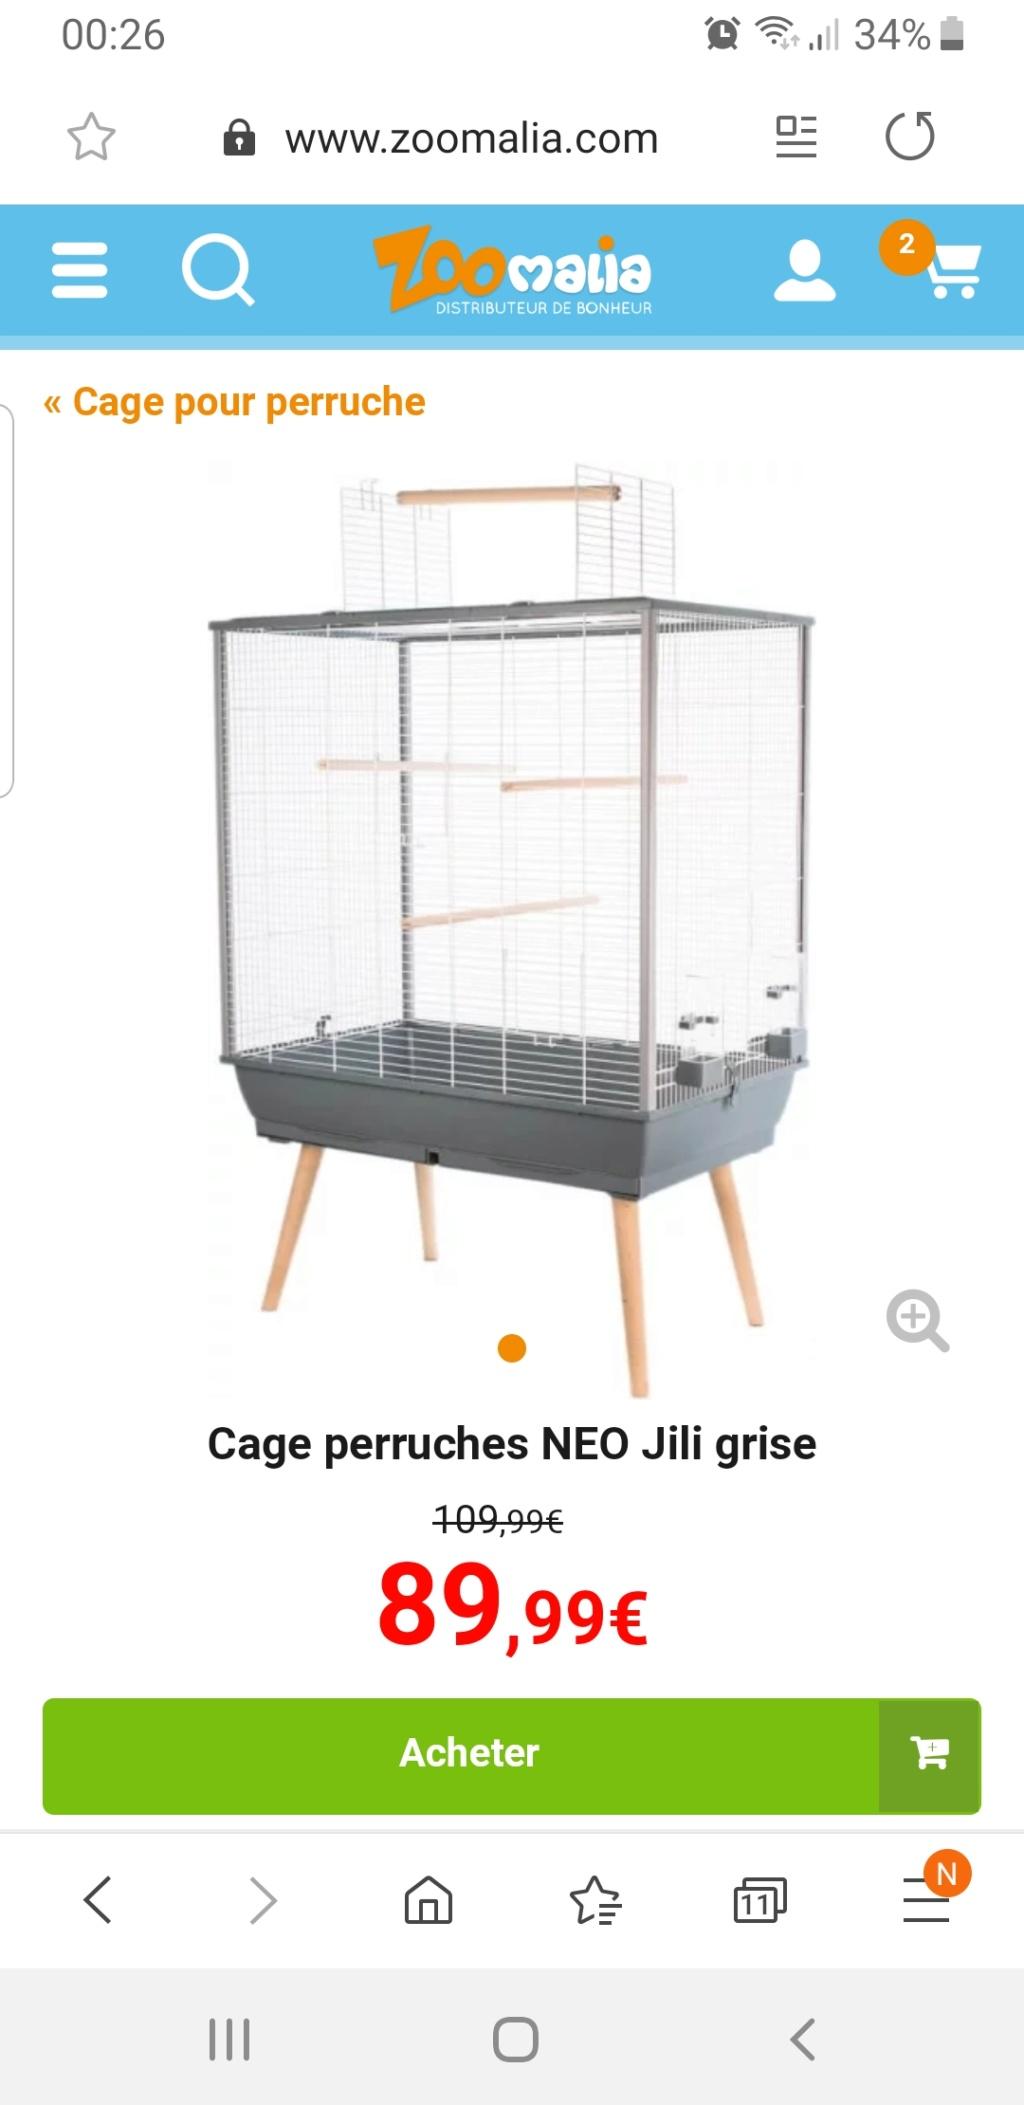 Combien de perruche puige mettre dans ma cage  Screen10